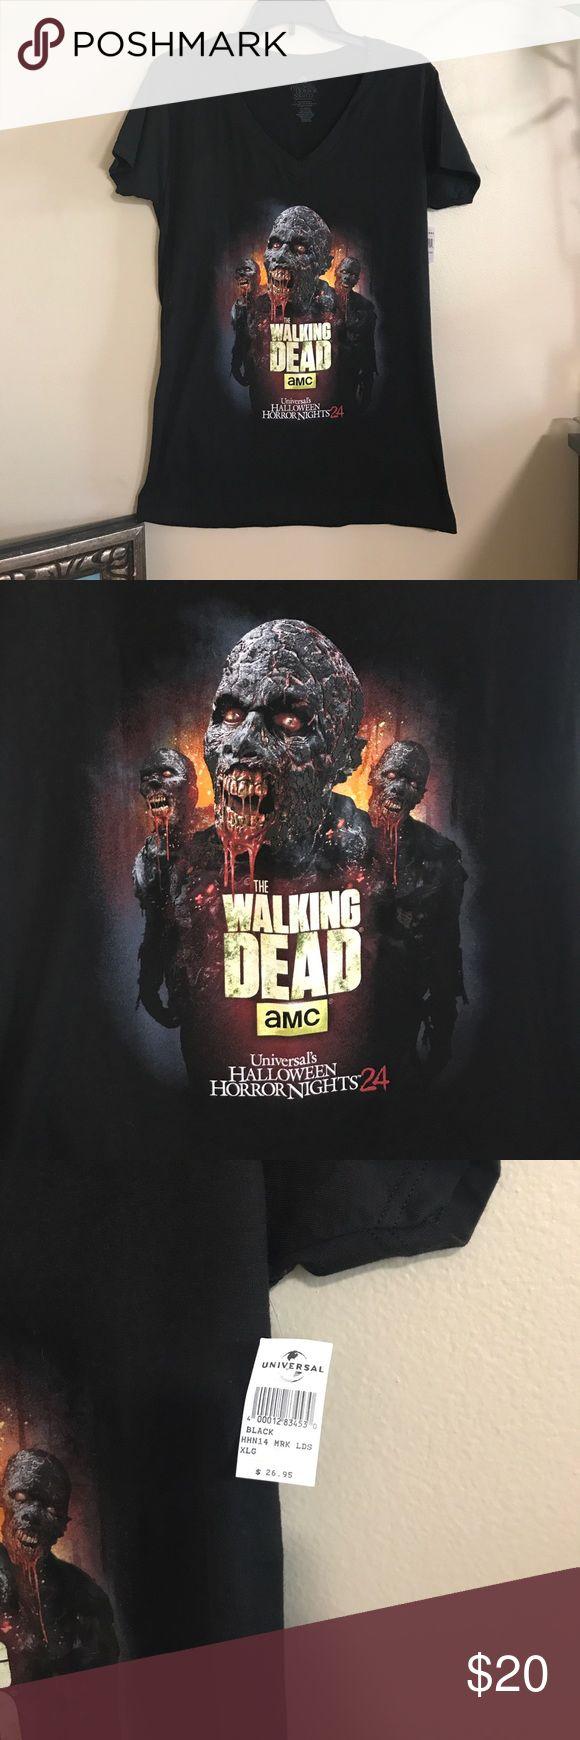 NWT The Walking Dead Tee!! Universal horror nights!!! Universal Studios Tops Tees - Short Sleeve